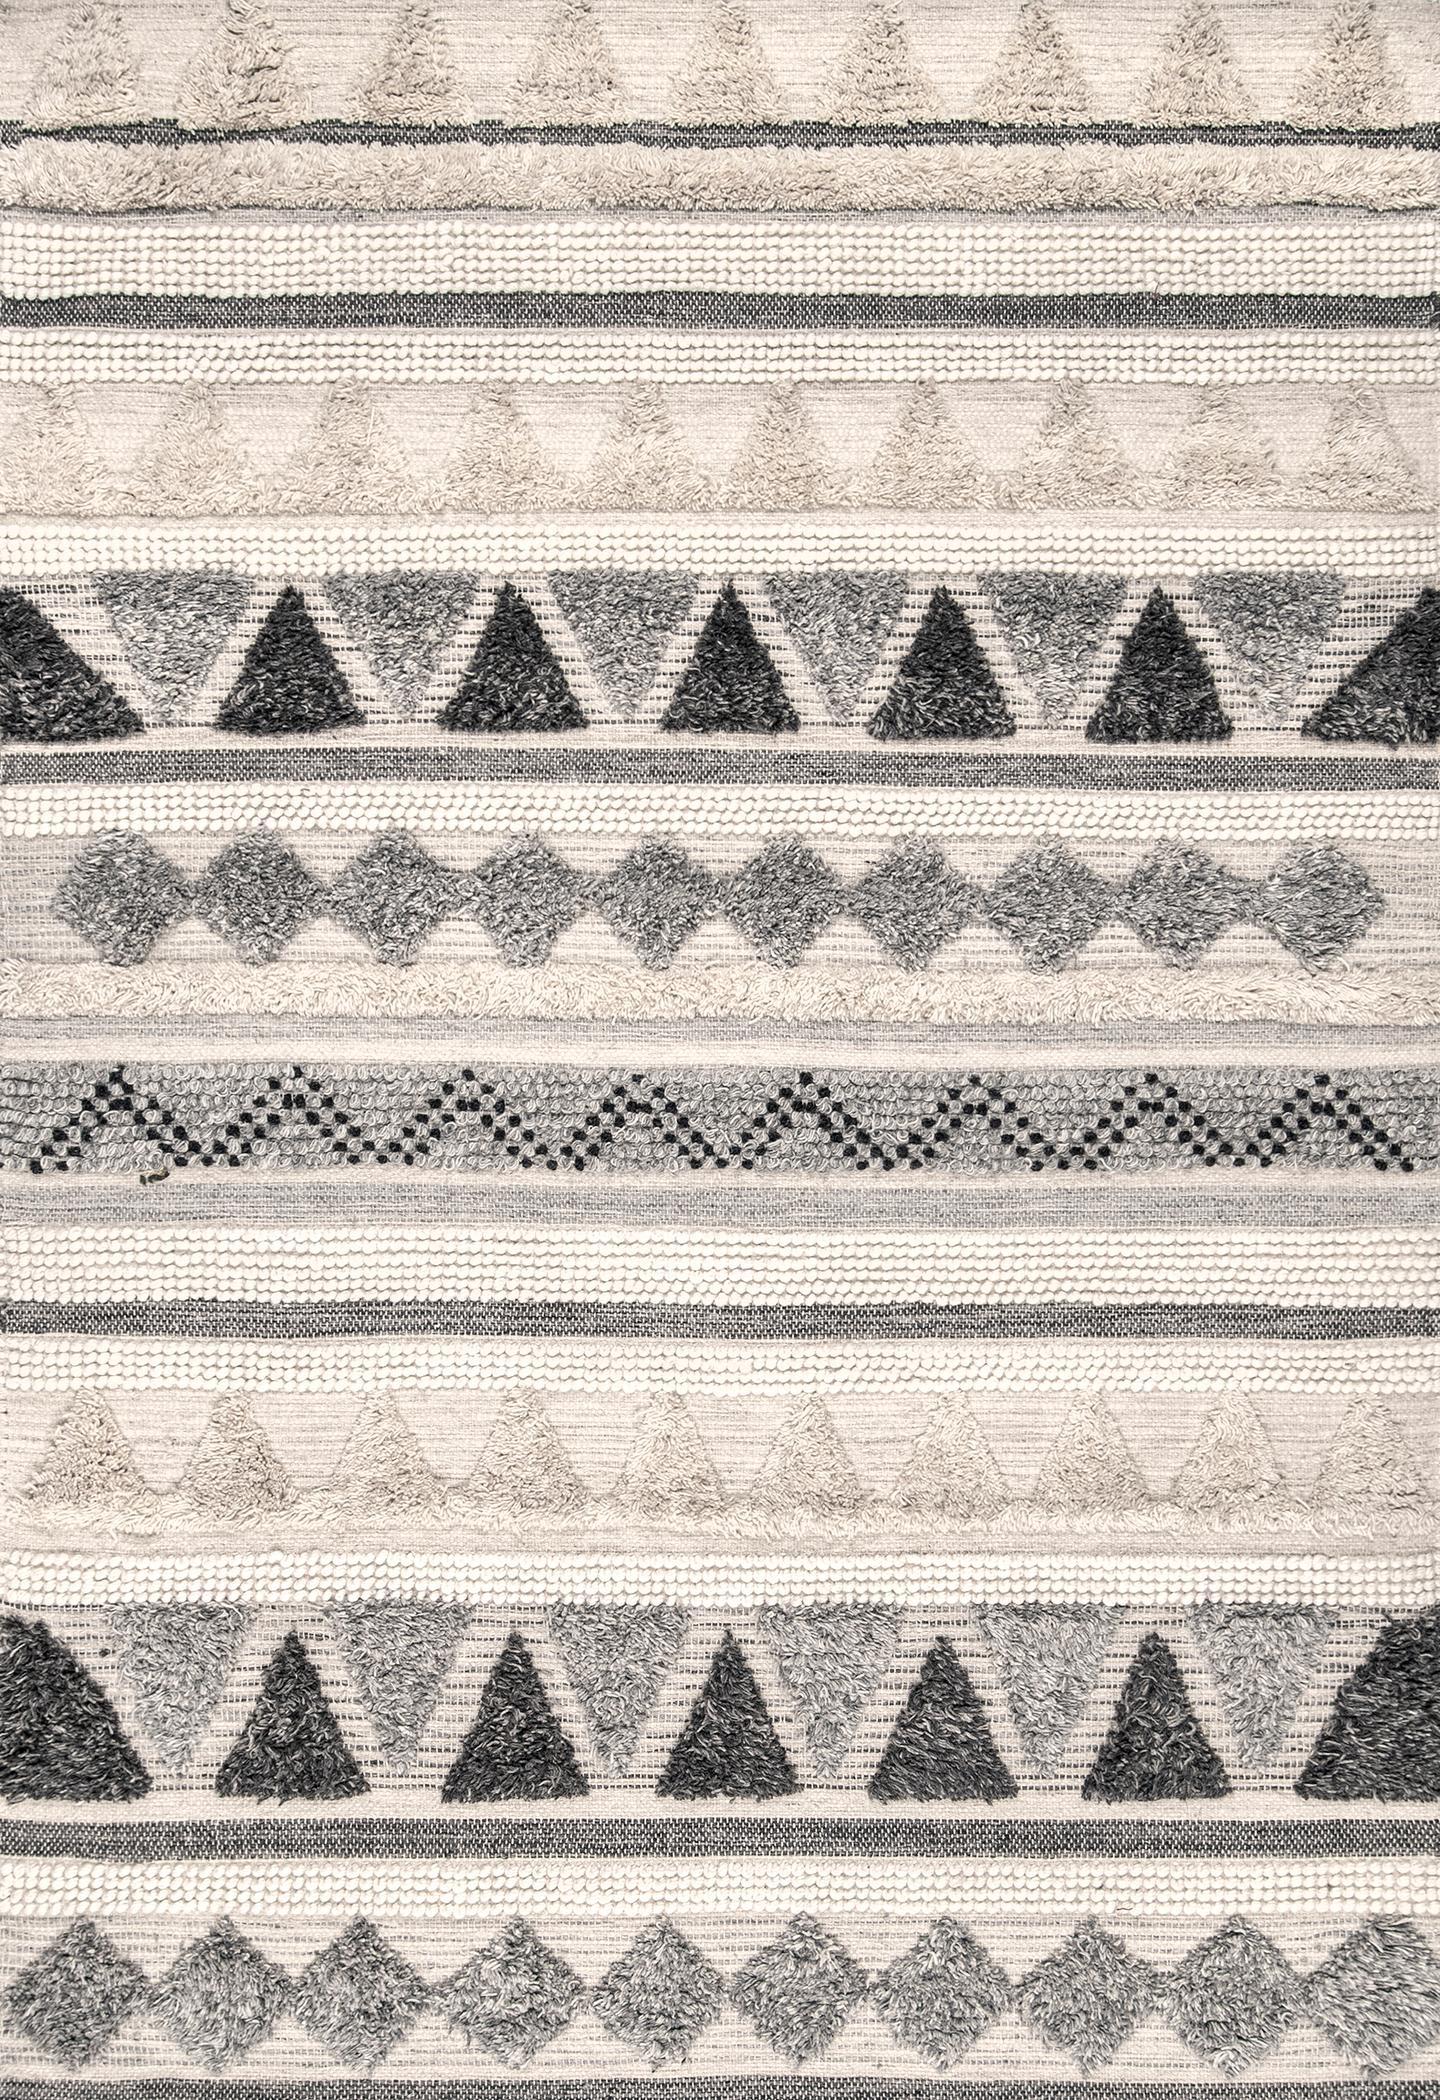 Hemera Shaggy Tribal Texture Rug by Rugs Usa